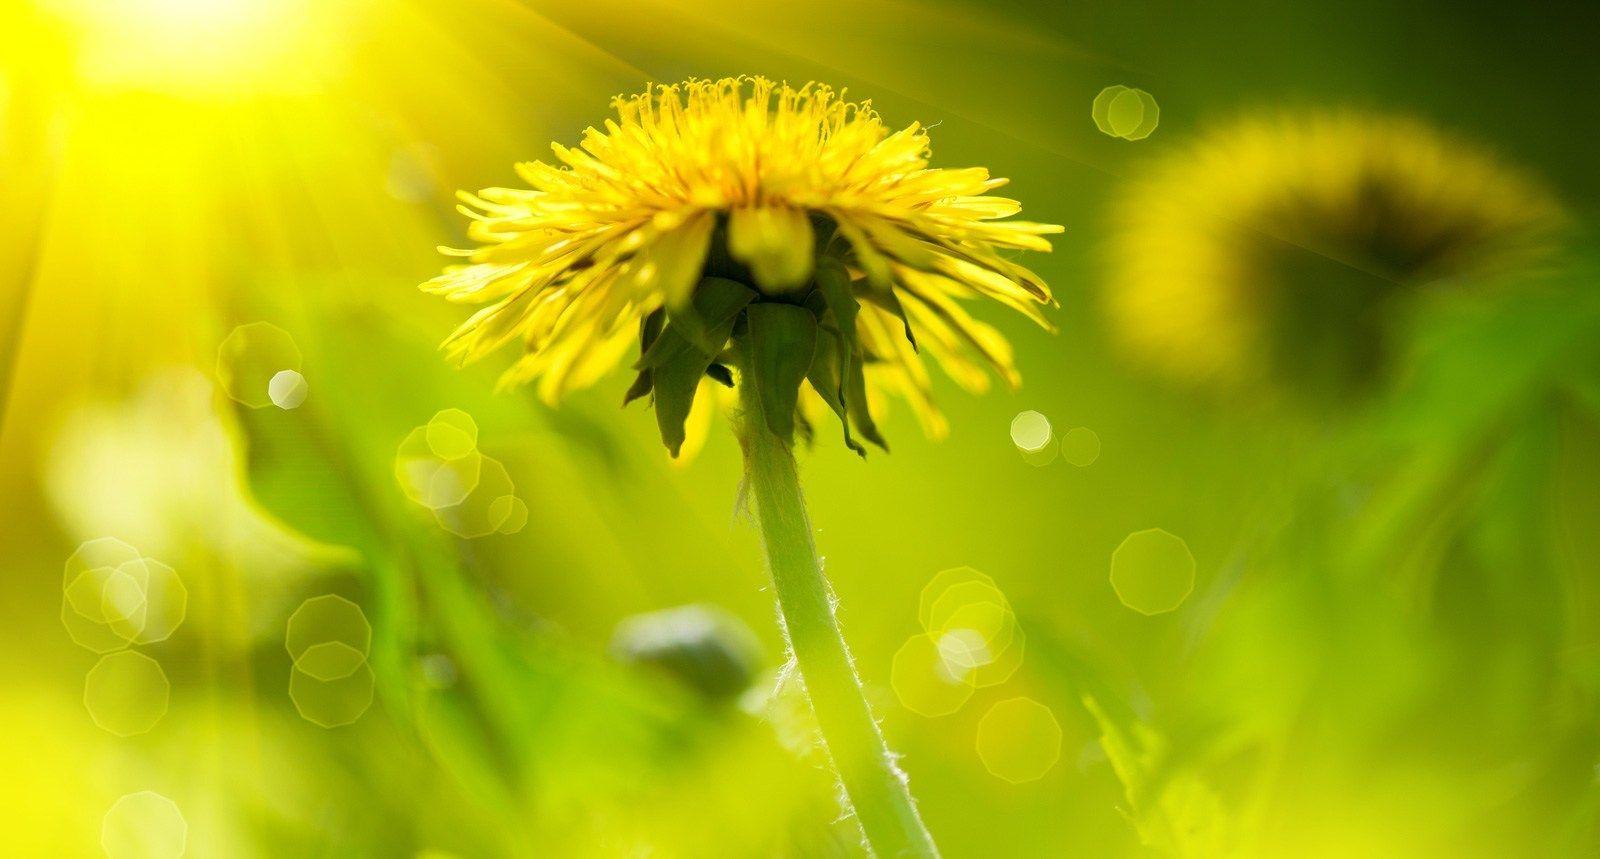 Blanket Of Good Dandelion Meaning Dandelion Flower Meanings